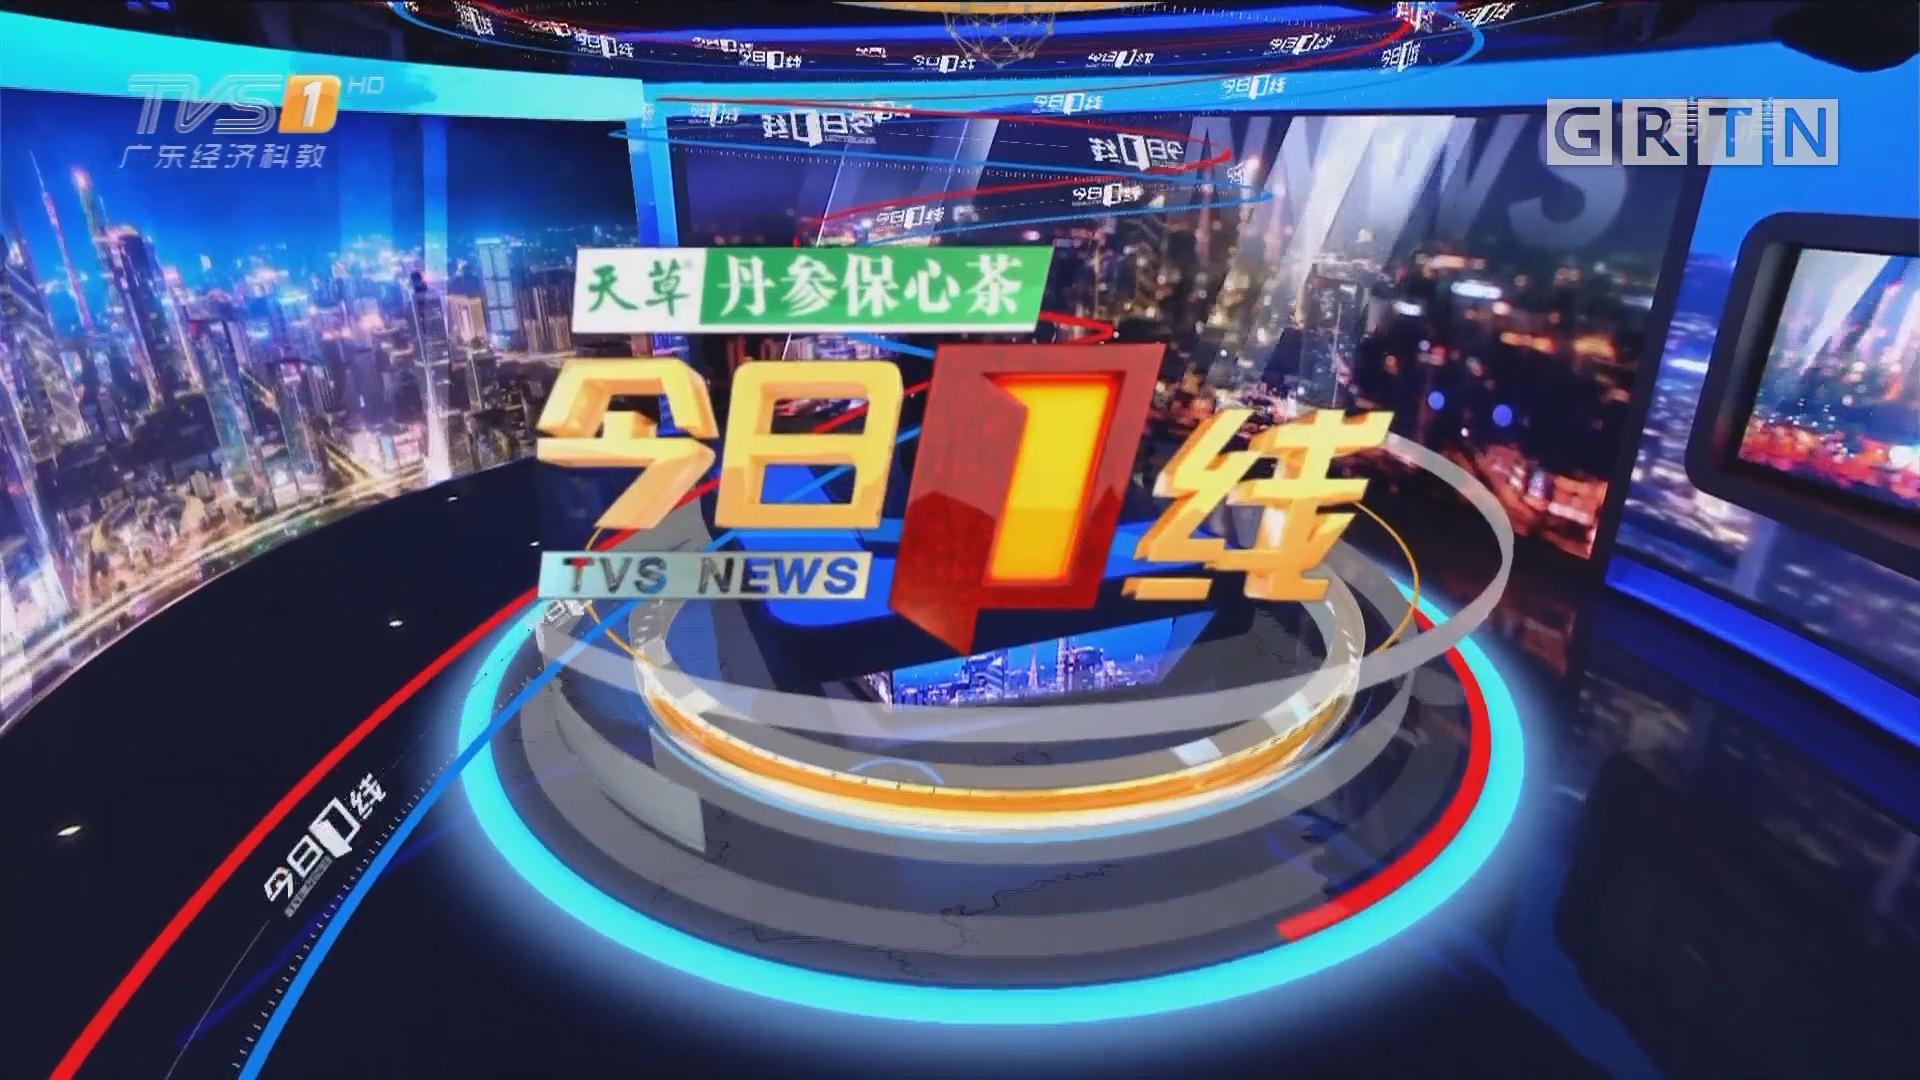 [HD][2018-10-08]今日一线:曝光不文明行为:男子夜袭肇庆古城墙 网上炫耀